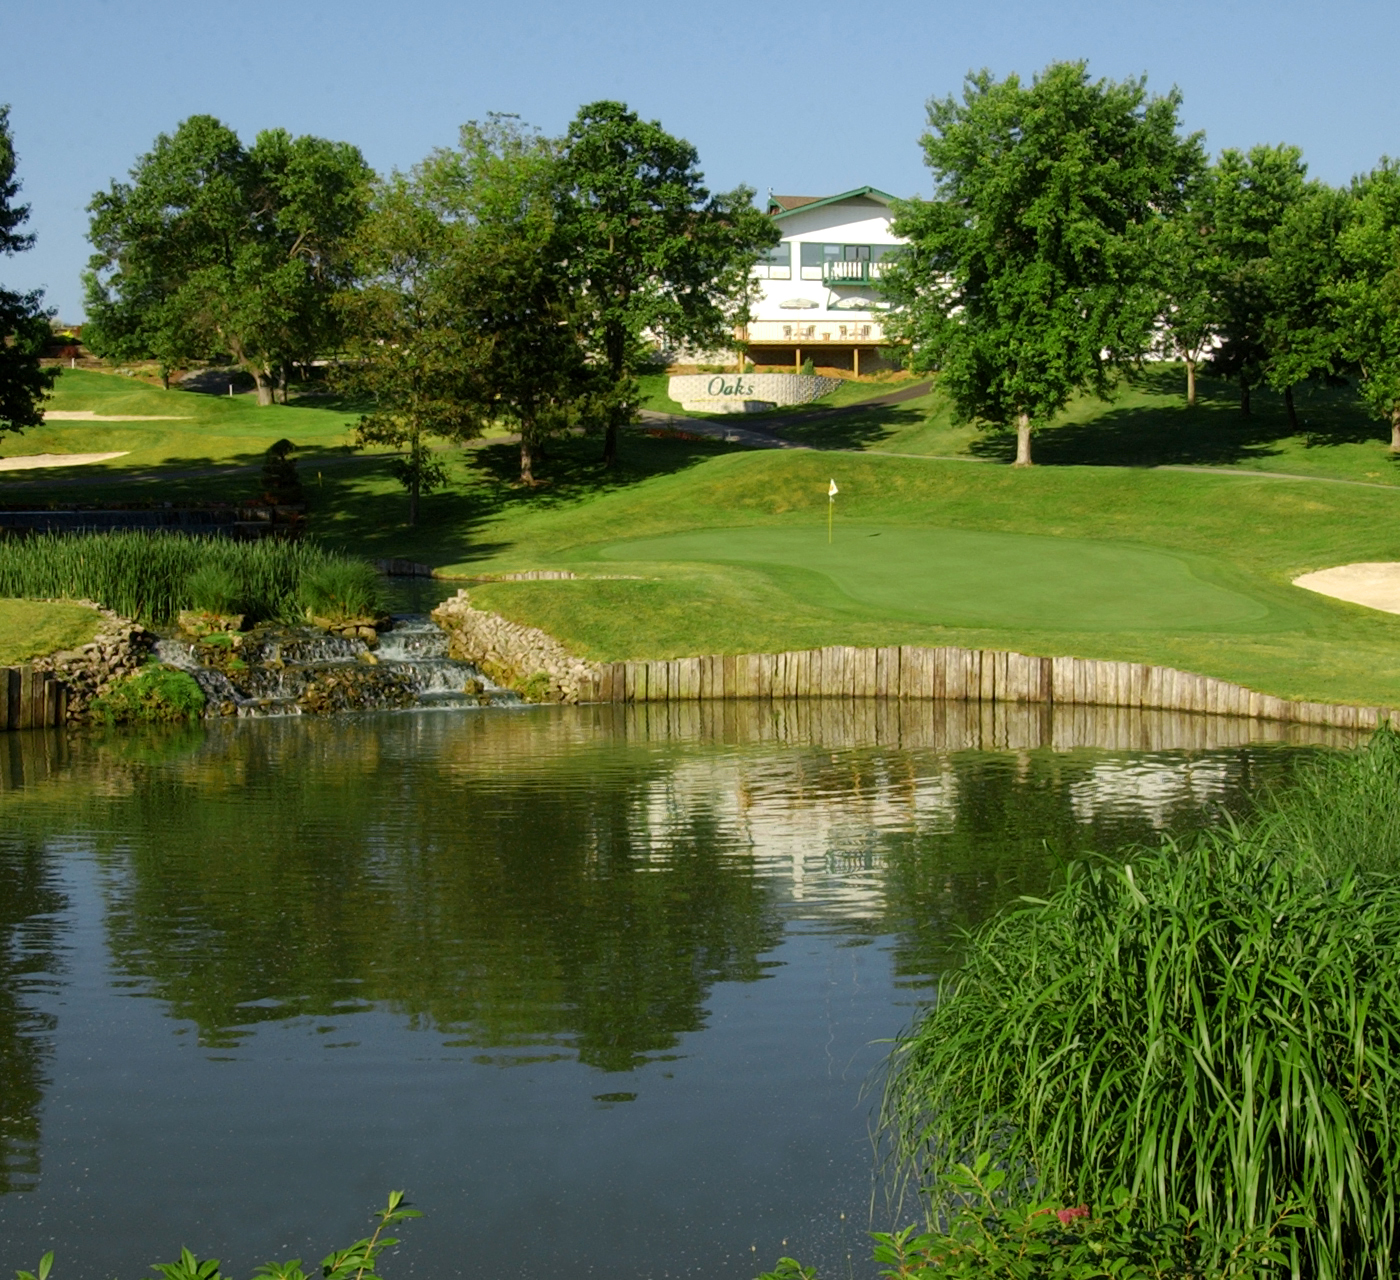 The Oaks Course at TanTarA Resort  Lake of the Ozarks